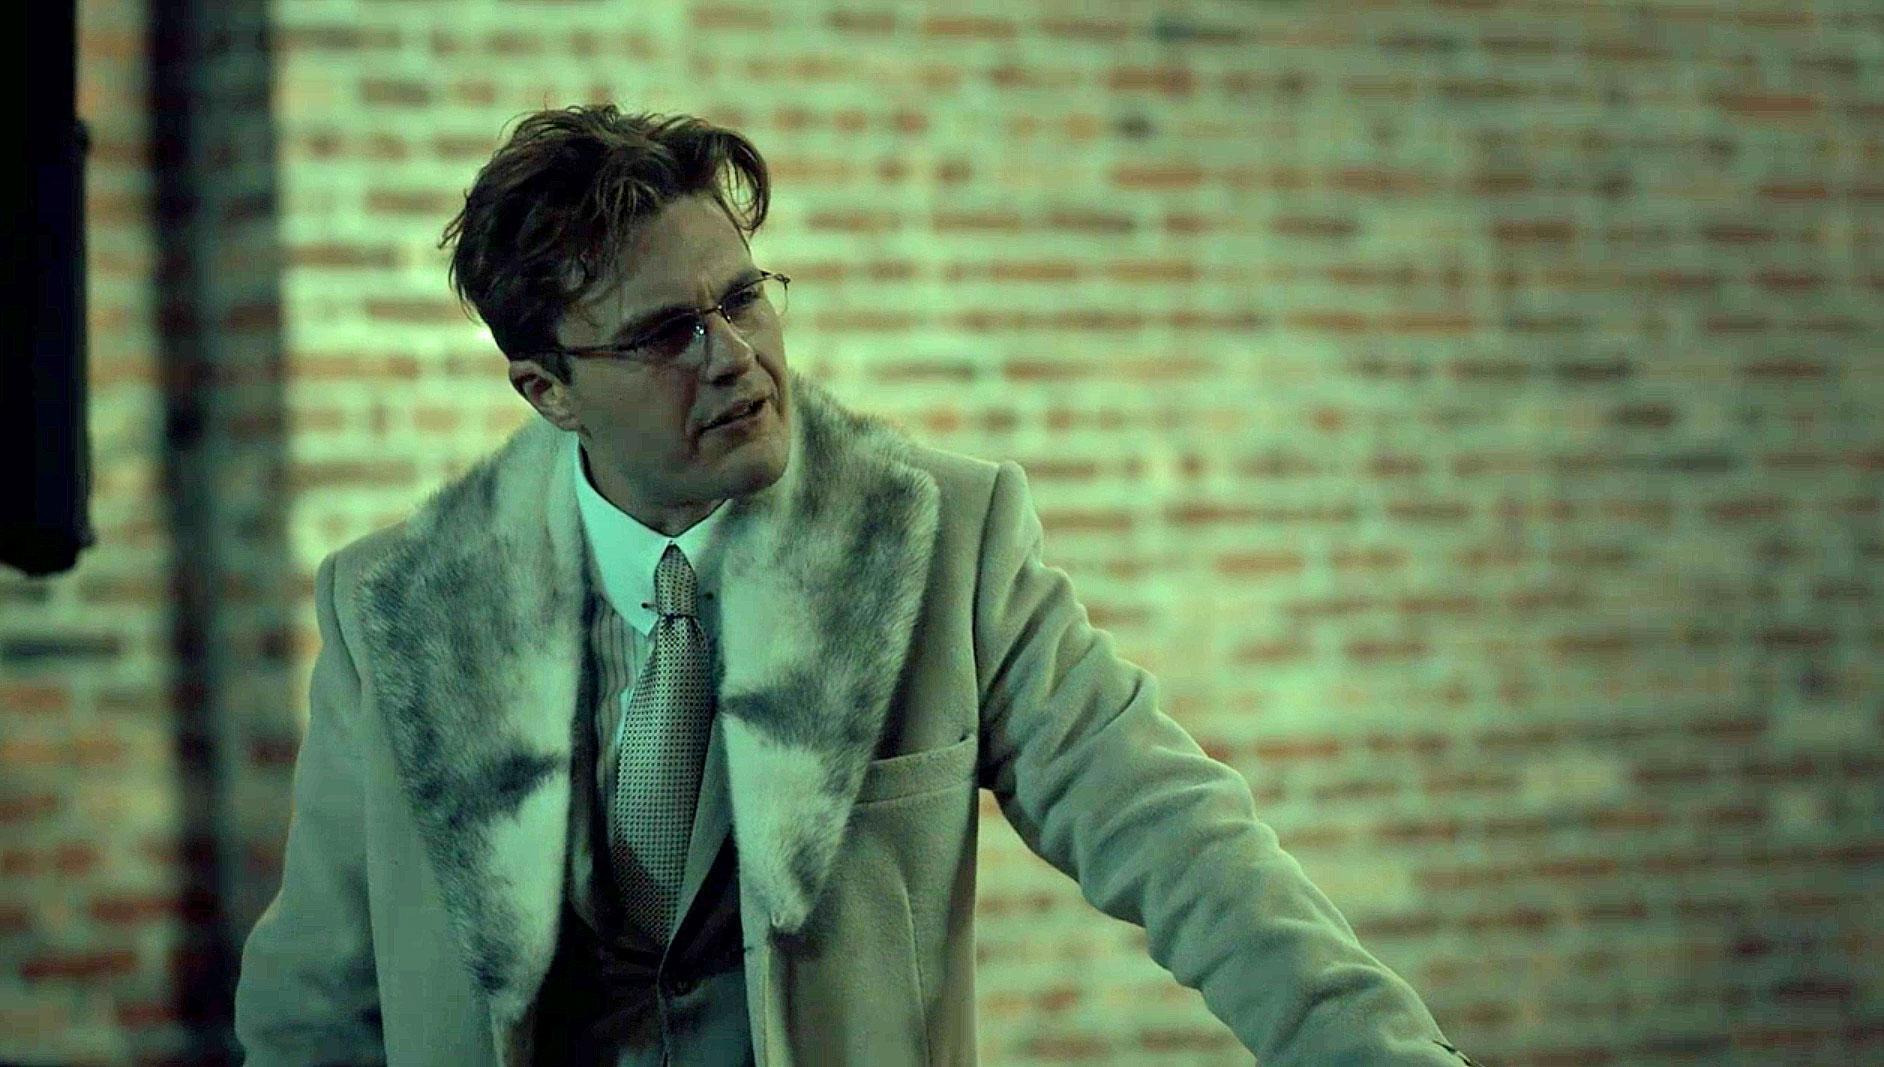 Mason Verger played by Michael Pitt